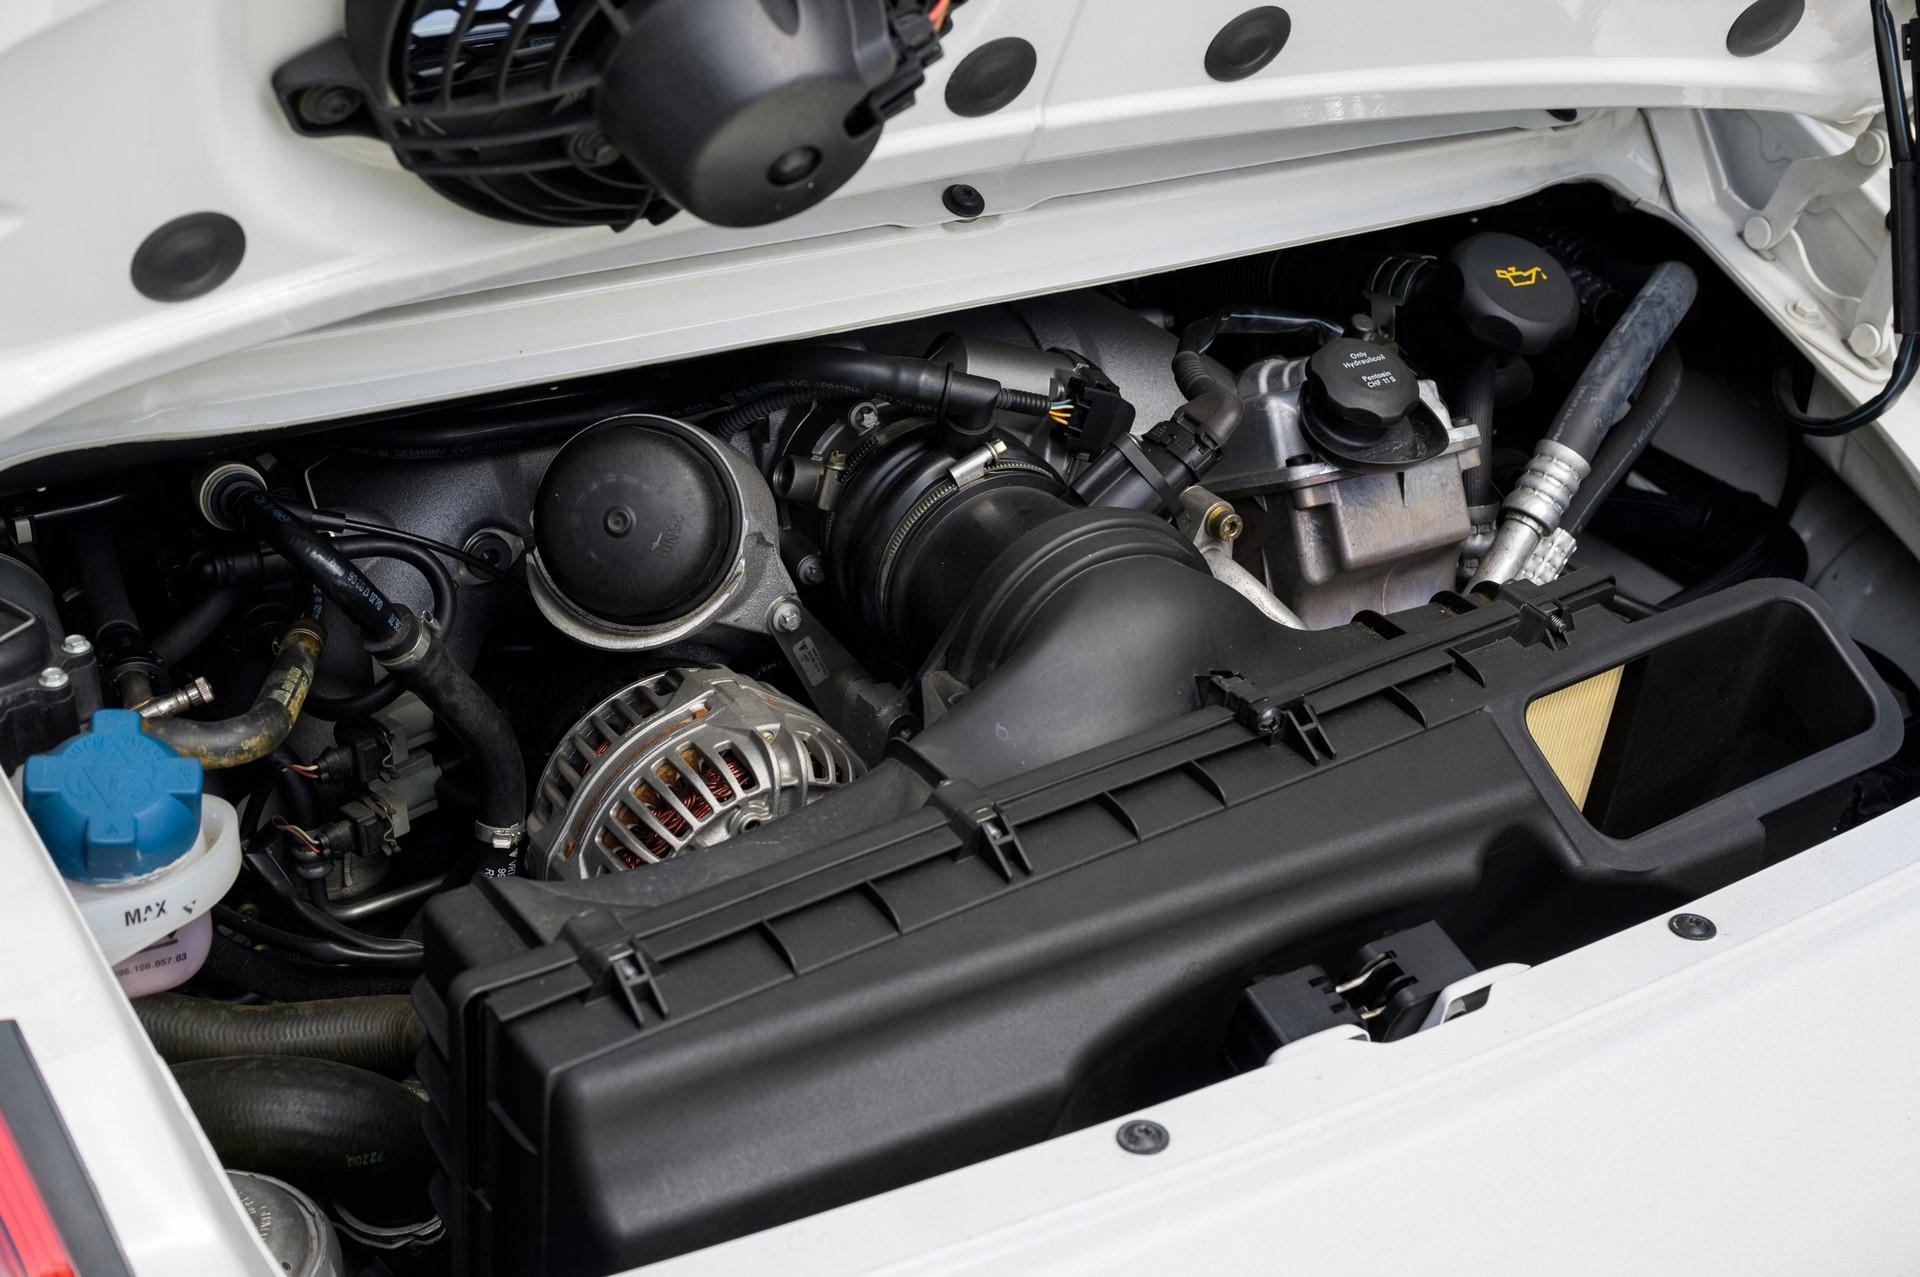 20-years-of-the-Porsche-911-GT3-32